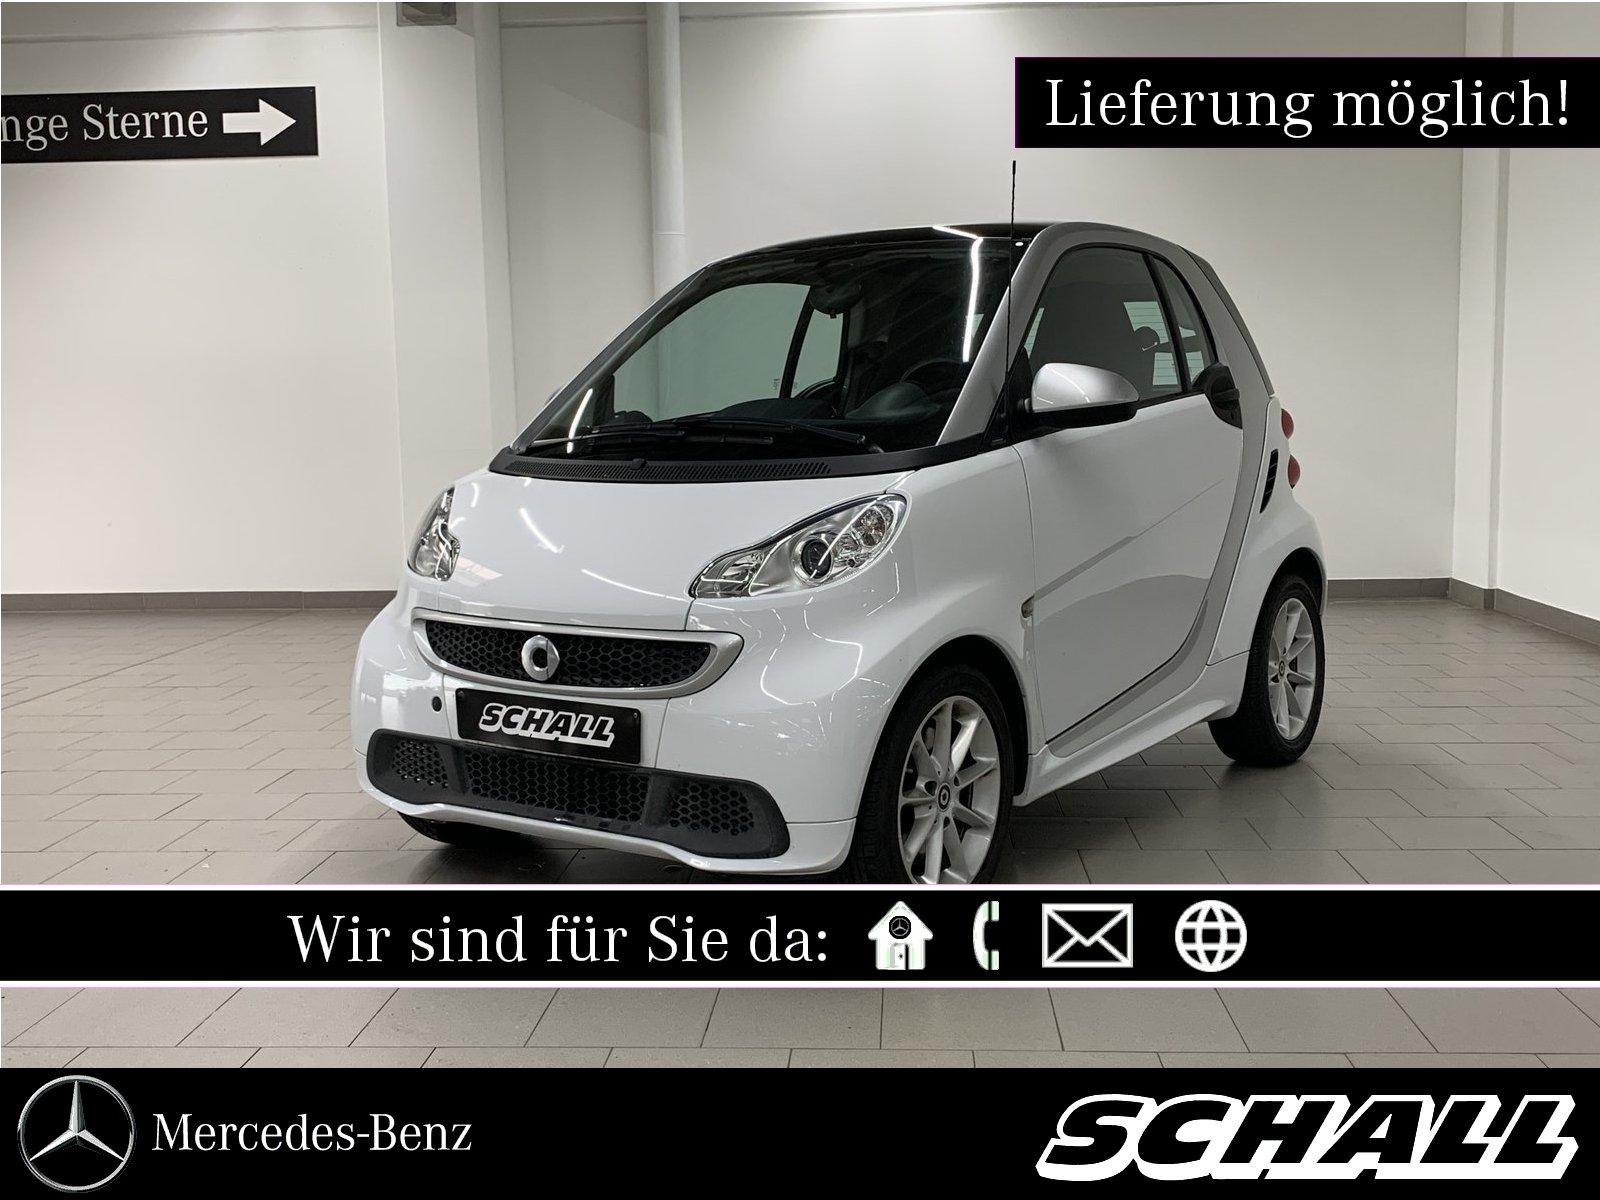 smart Smart Fortwo Coupe 5G-AUTOM/PANO/KLIMA/ALUFELGEN, Jahr 2014, Benzin